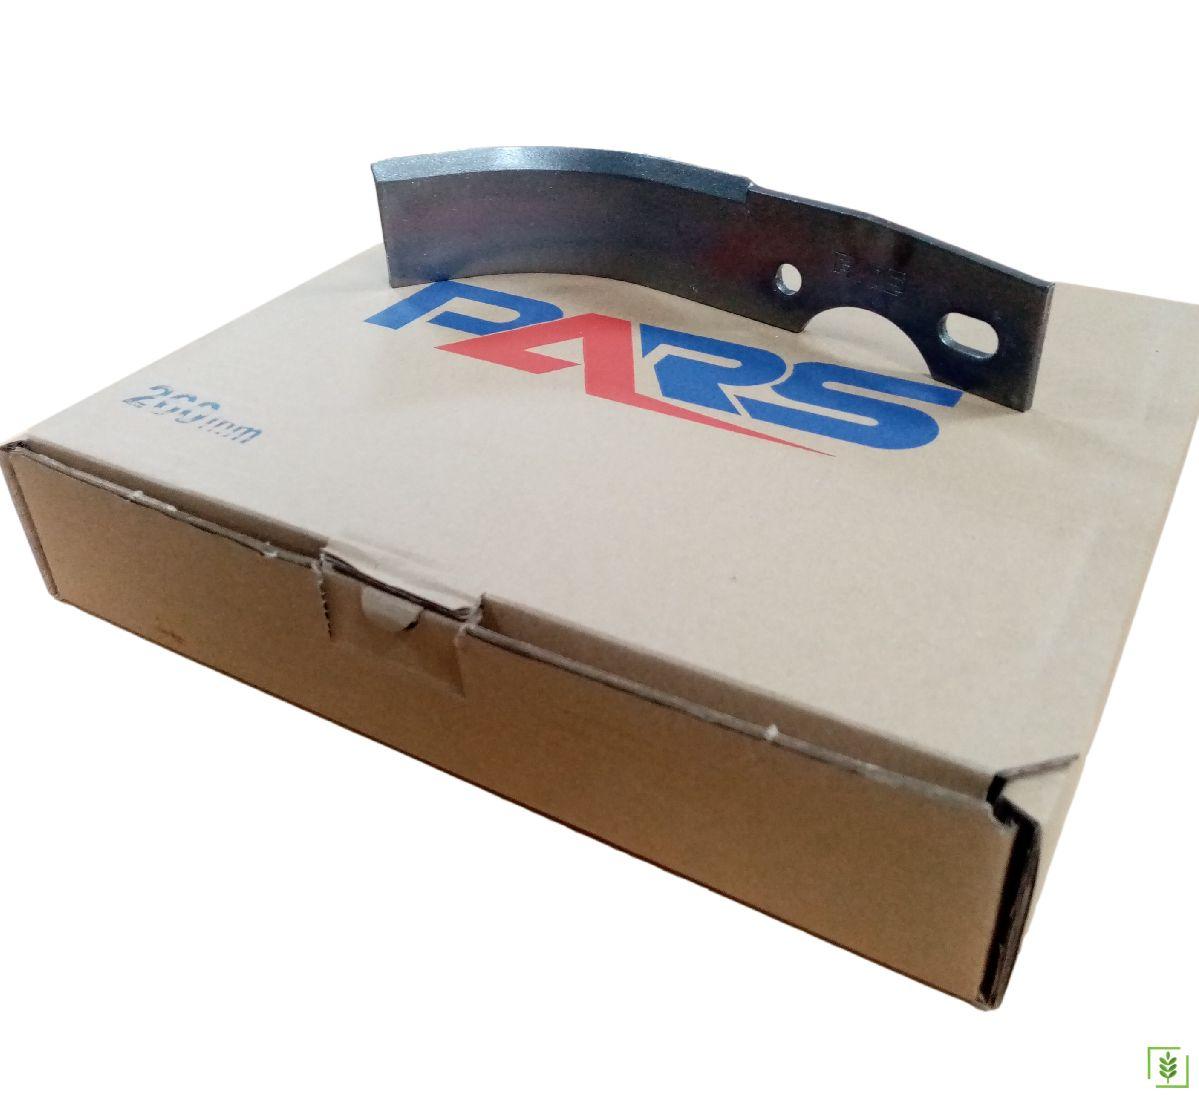 Üniversal Çapa Makinası Bıçağı Benzinli Modeller 24 ad